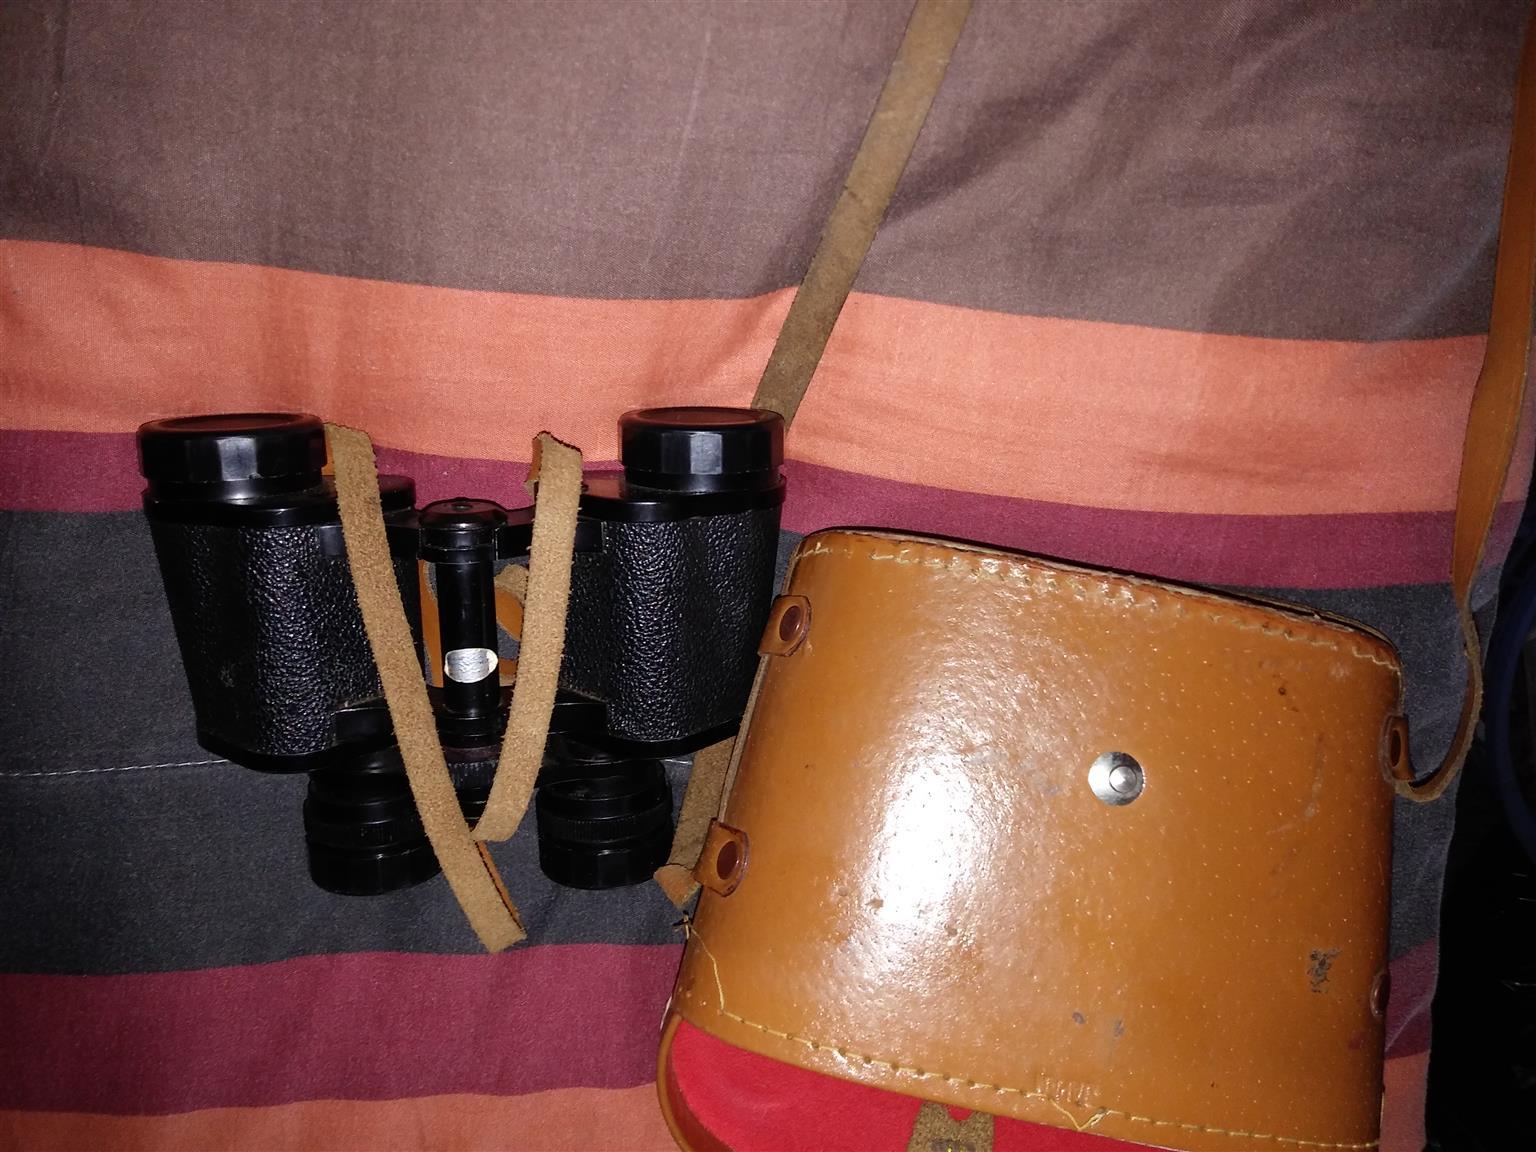 Zenith optical Binocular 8x30